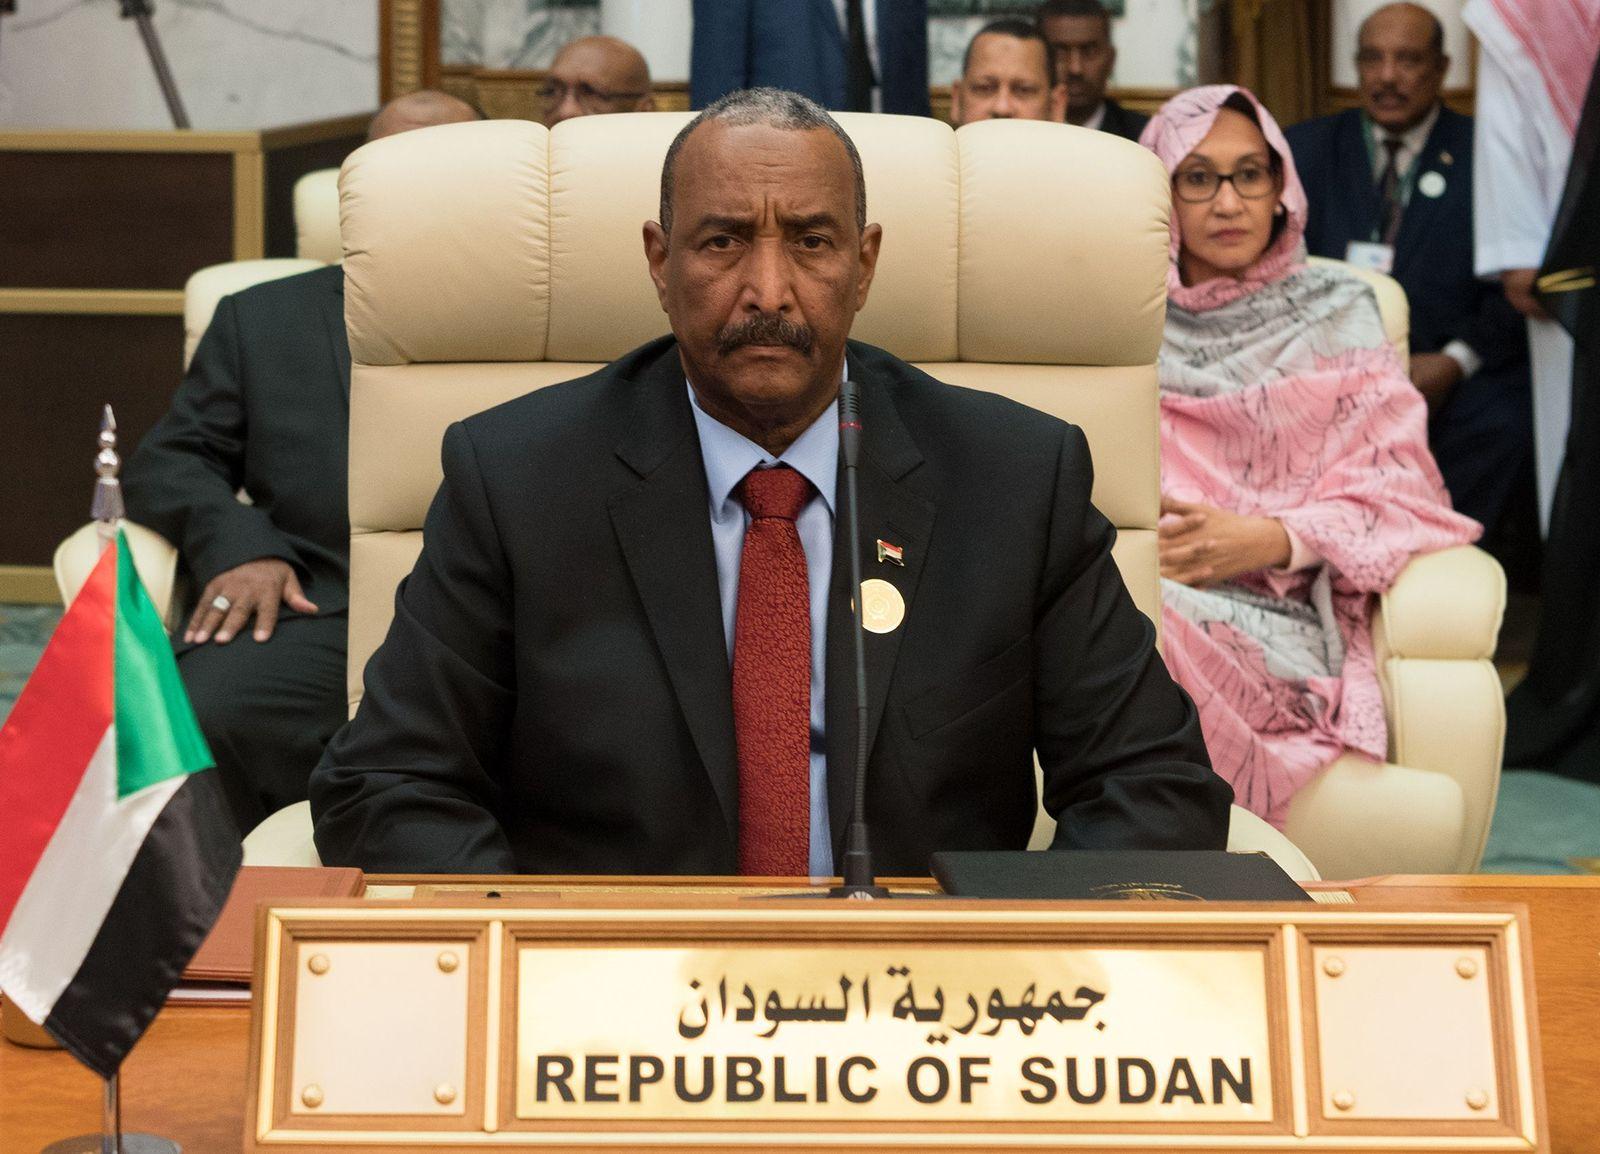 Abdel Fattah al-Burhan Sudan